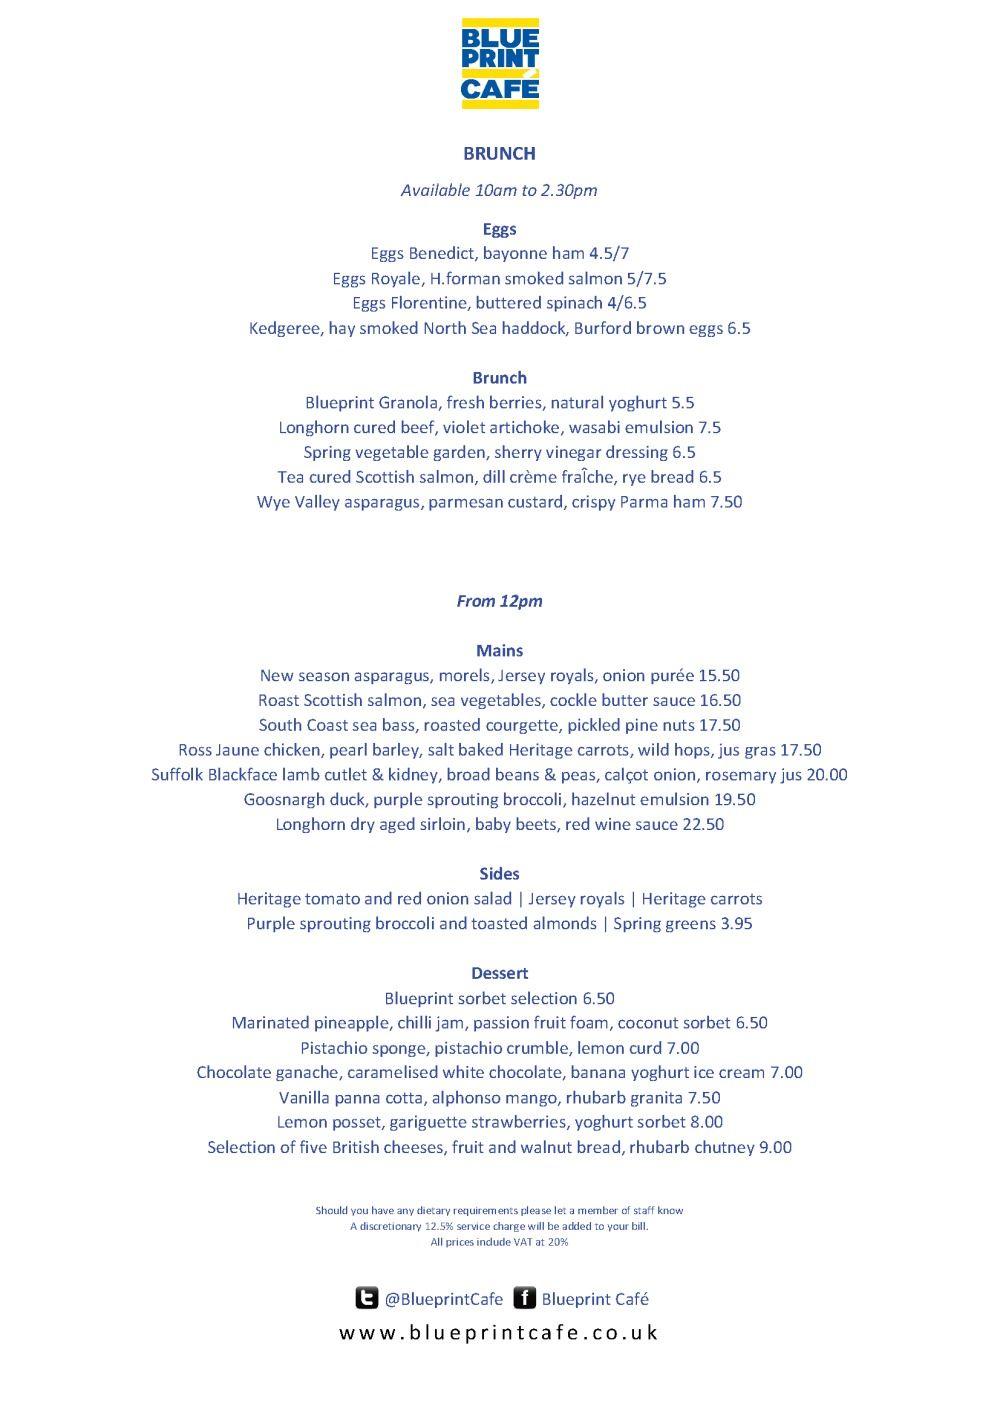 Saturday brunch menu blue print cafe ideas for brunch outings saturday brunch menu blue print cafe malvernweather Images